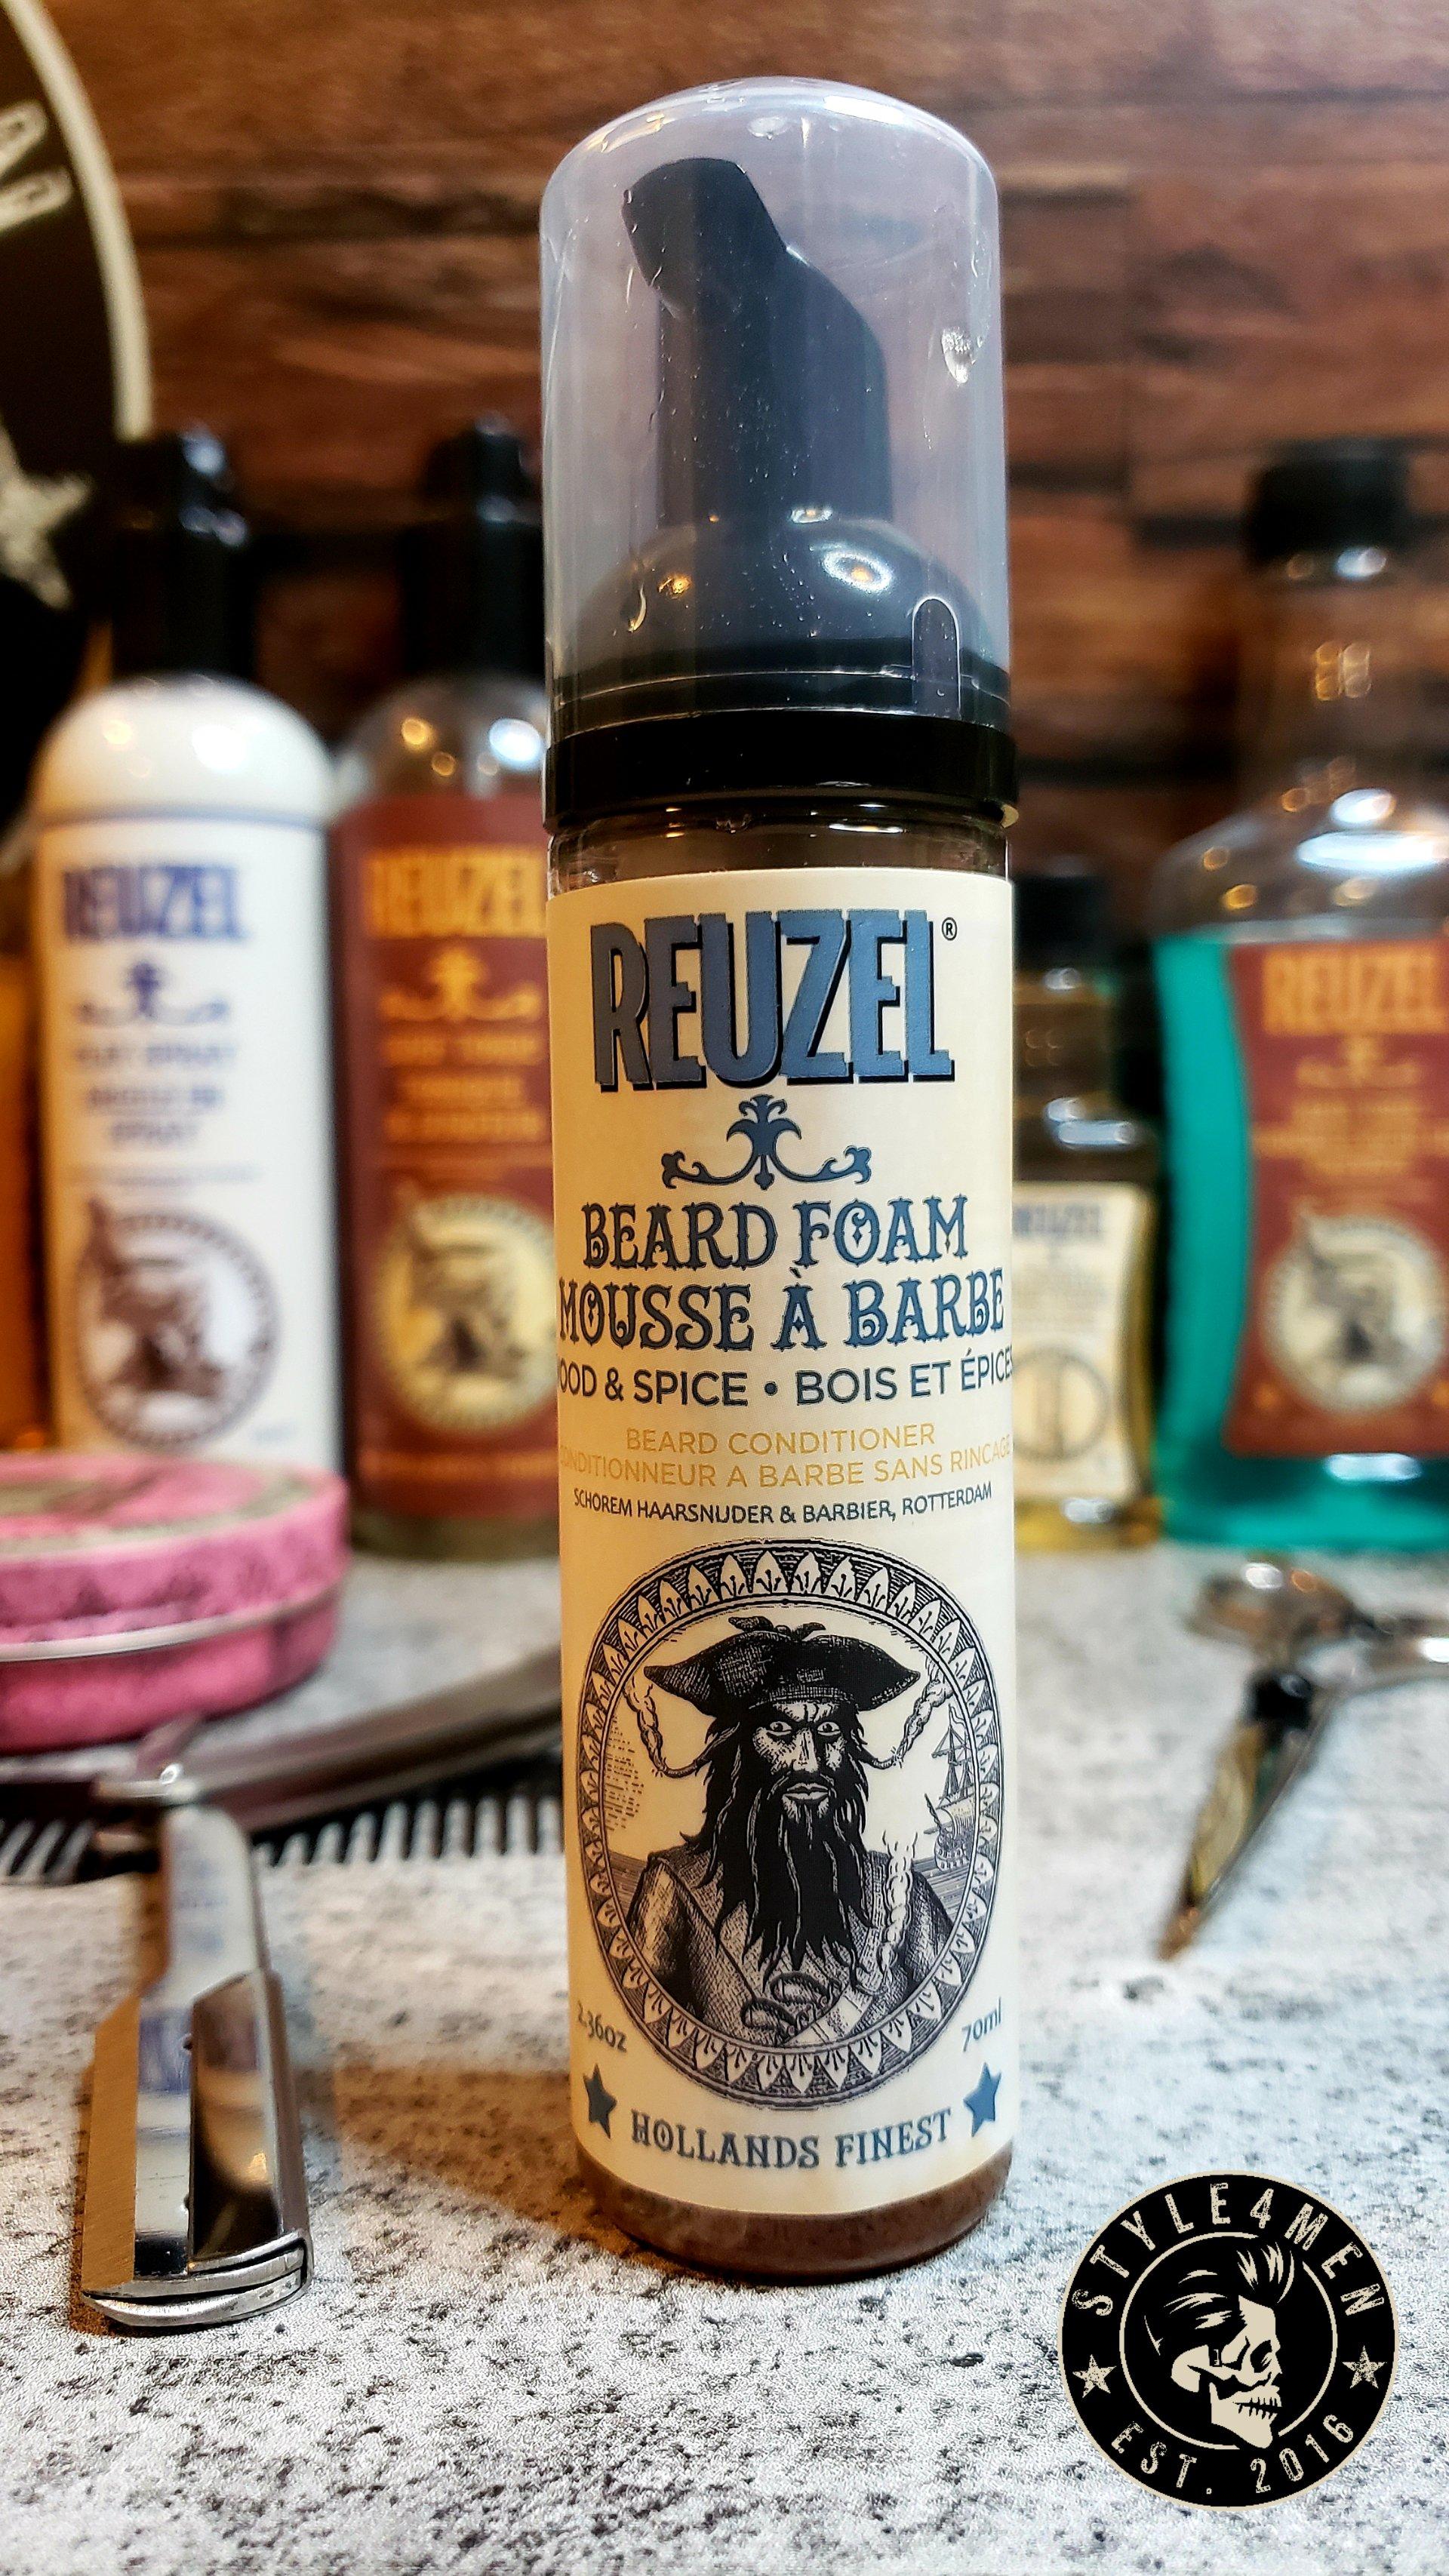 REUZEL's Beard Foam – The convenience that was missing